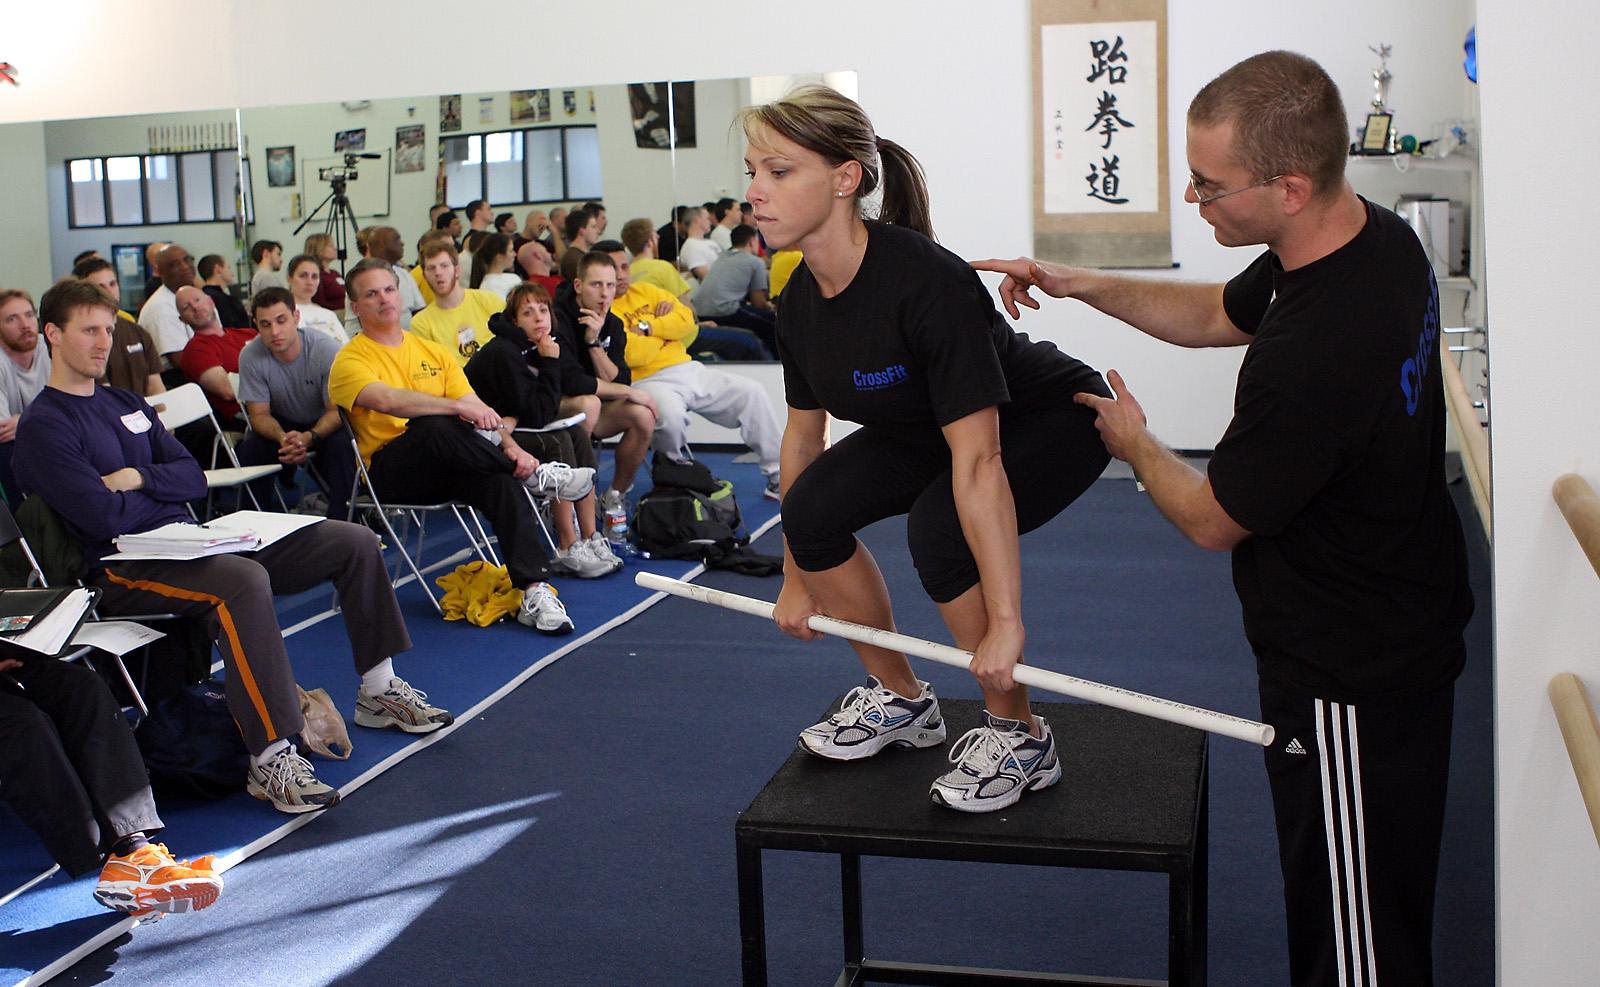 CrossFit: Forging Elite Fitness: Sunday 080210